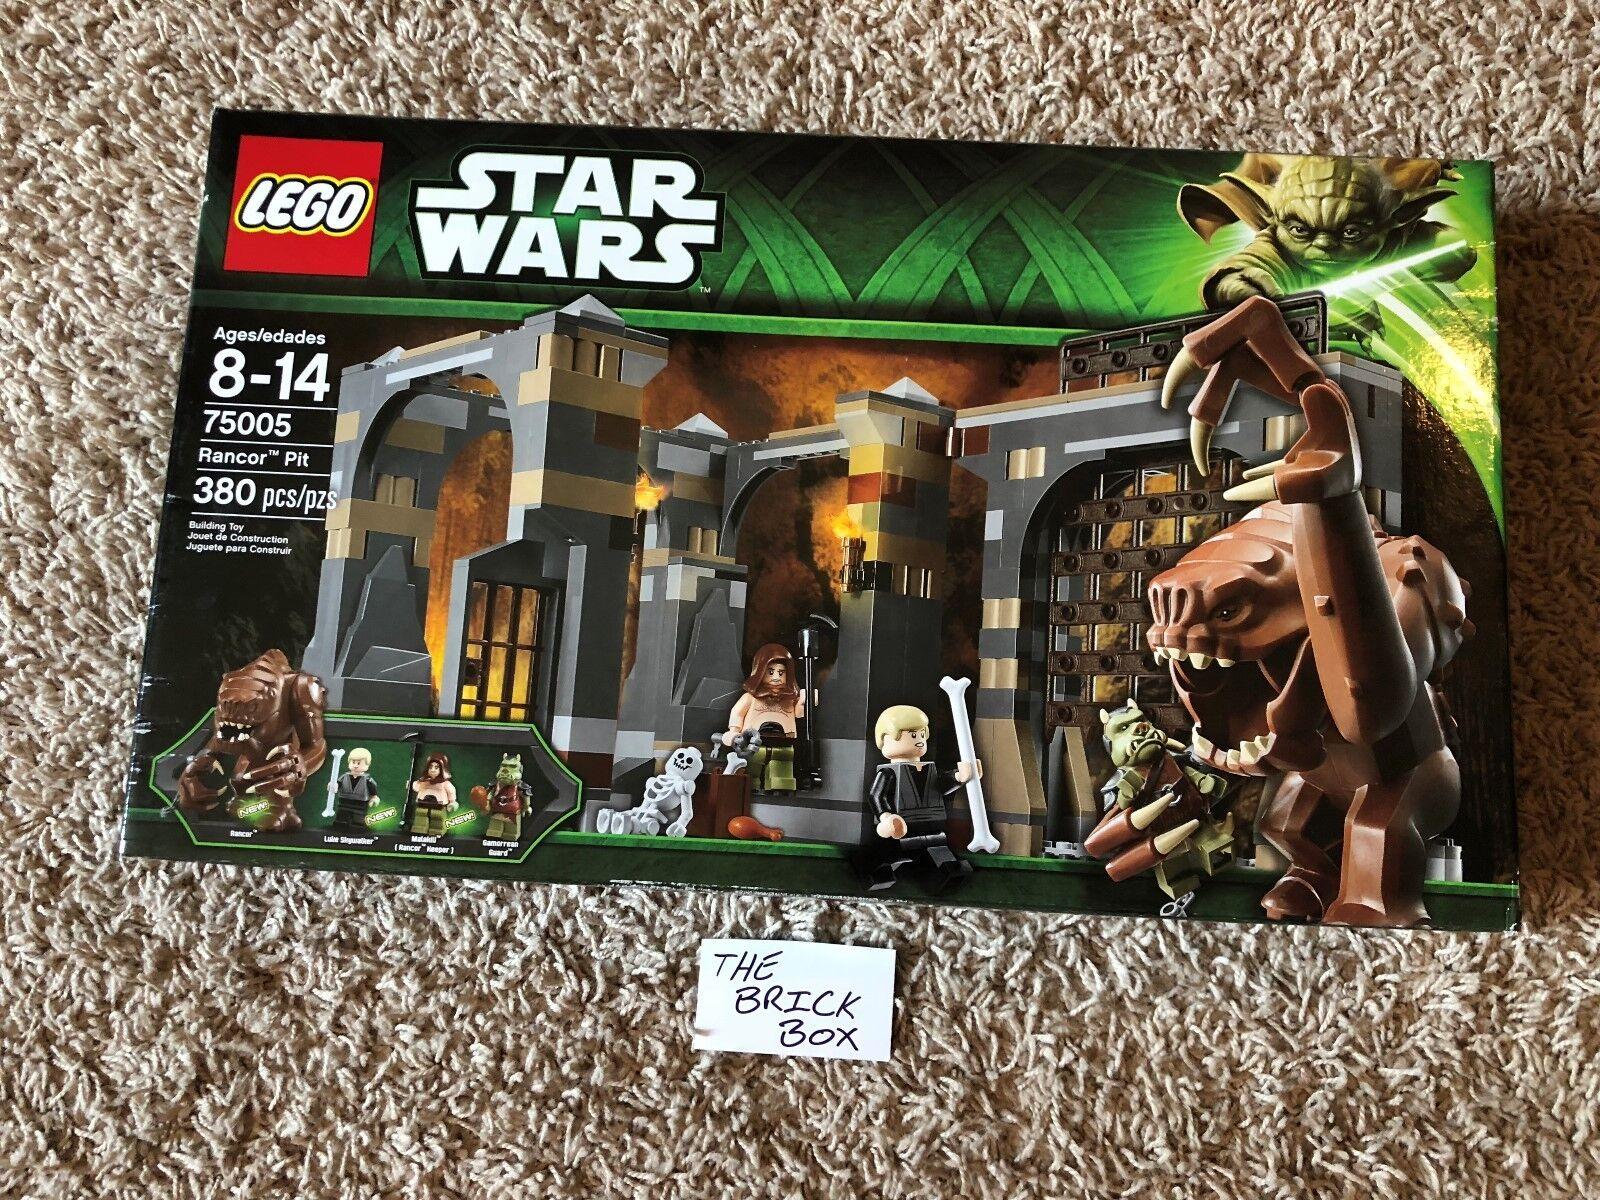 LEGO STAR WARS 75005 RANCOR PIT - NEW & SEALED - RETIROT SET - FREE SHIPPING